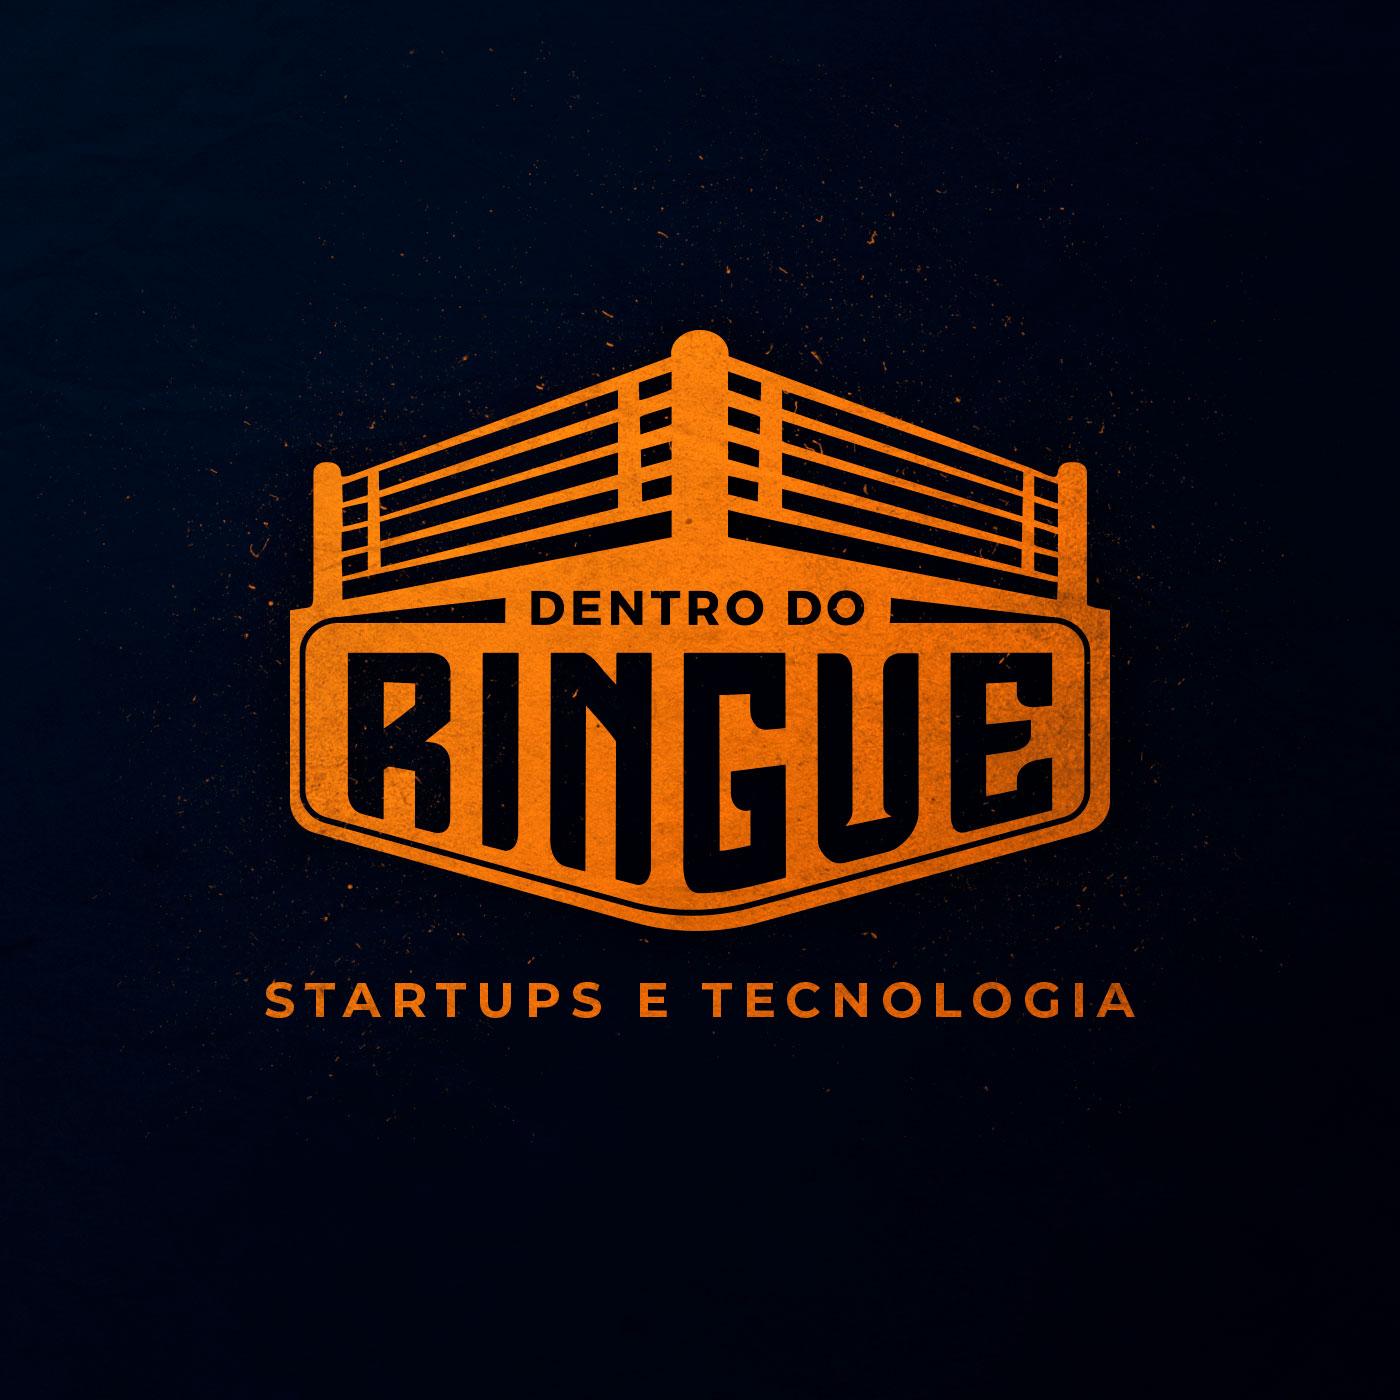 Dentro do Ringue - Startups e Tecnologia